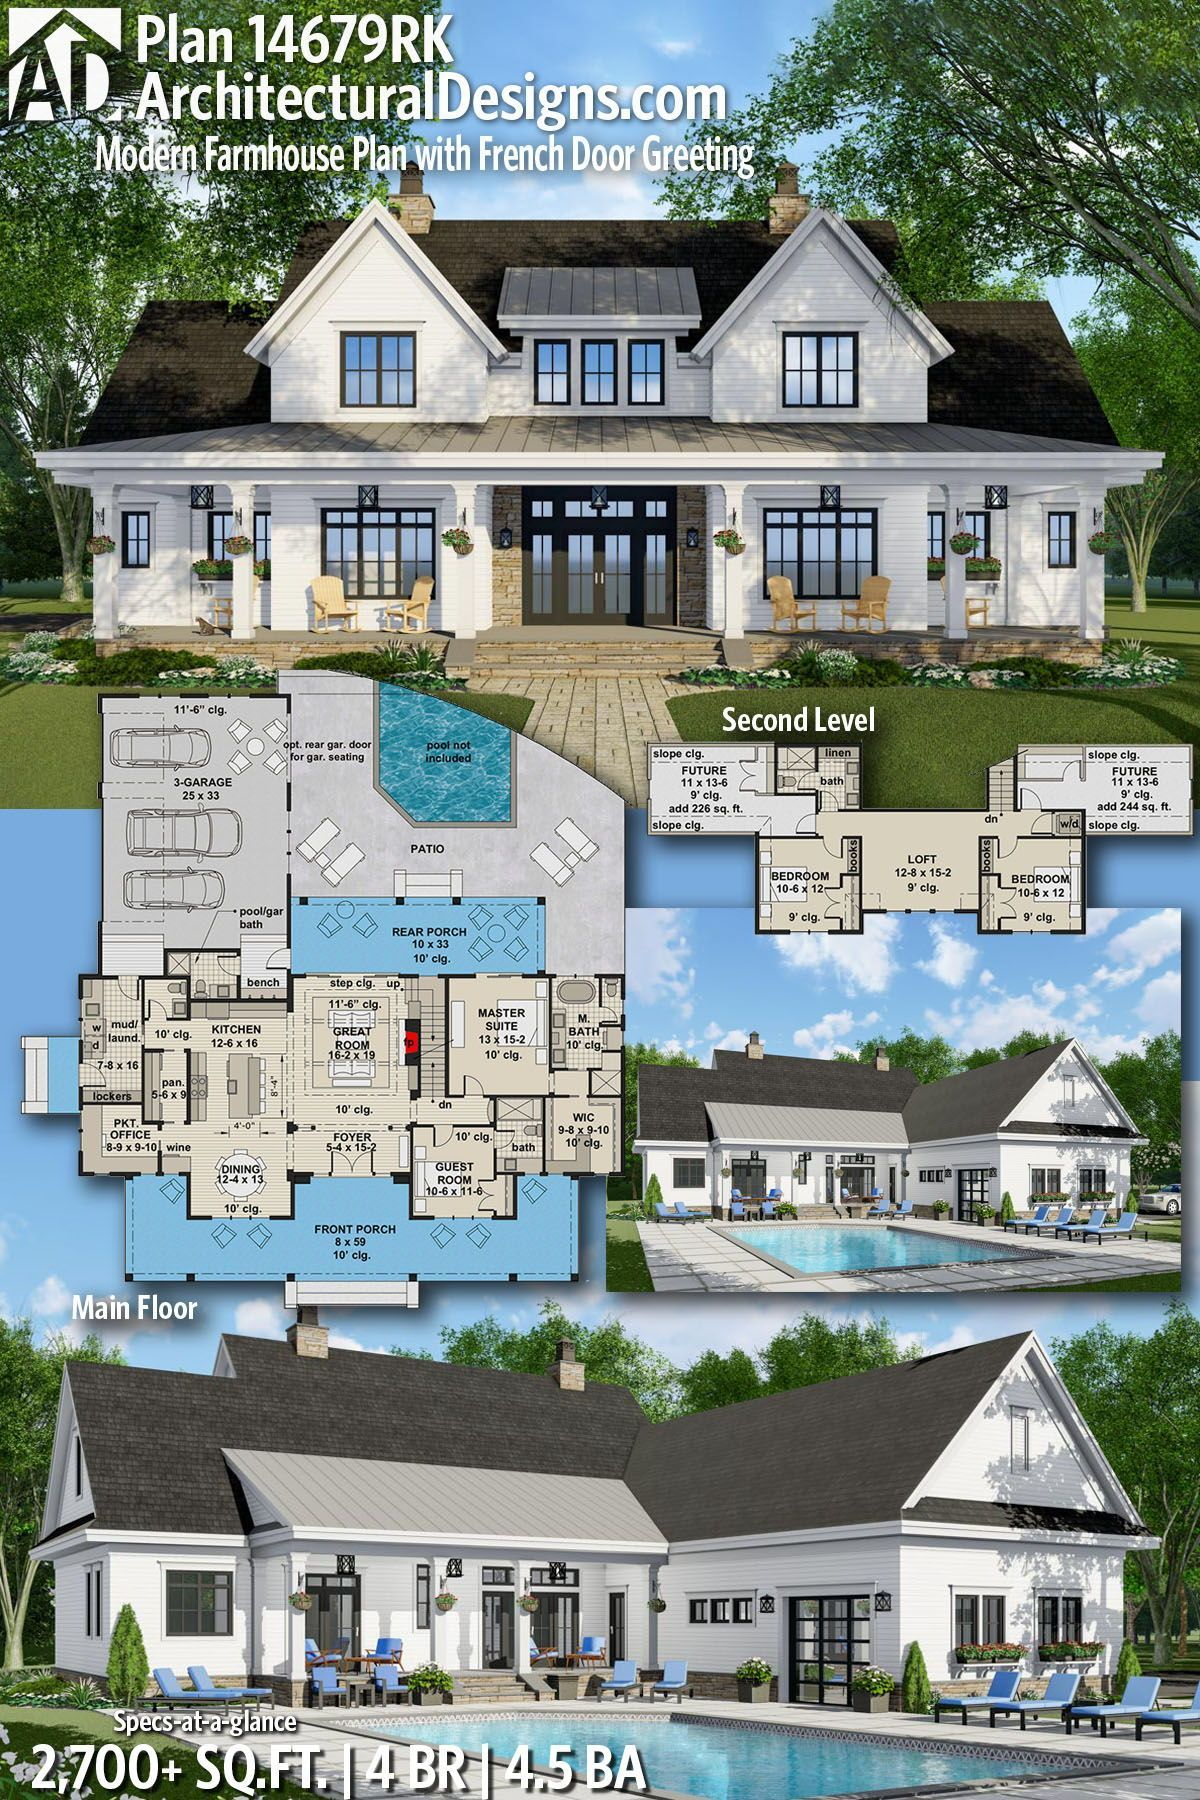 Plan 14679RK: Modern Farmhouse Plan with French Do